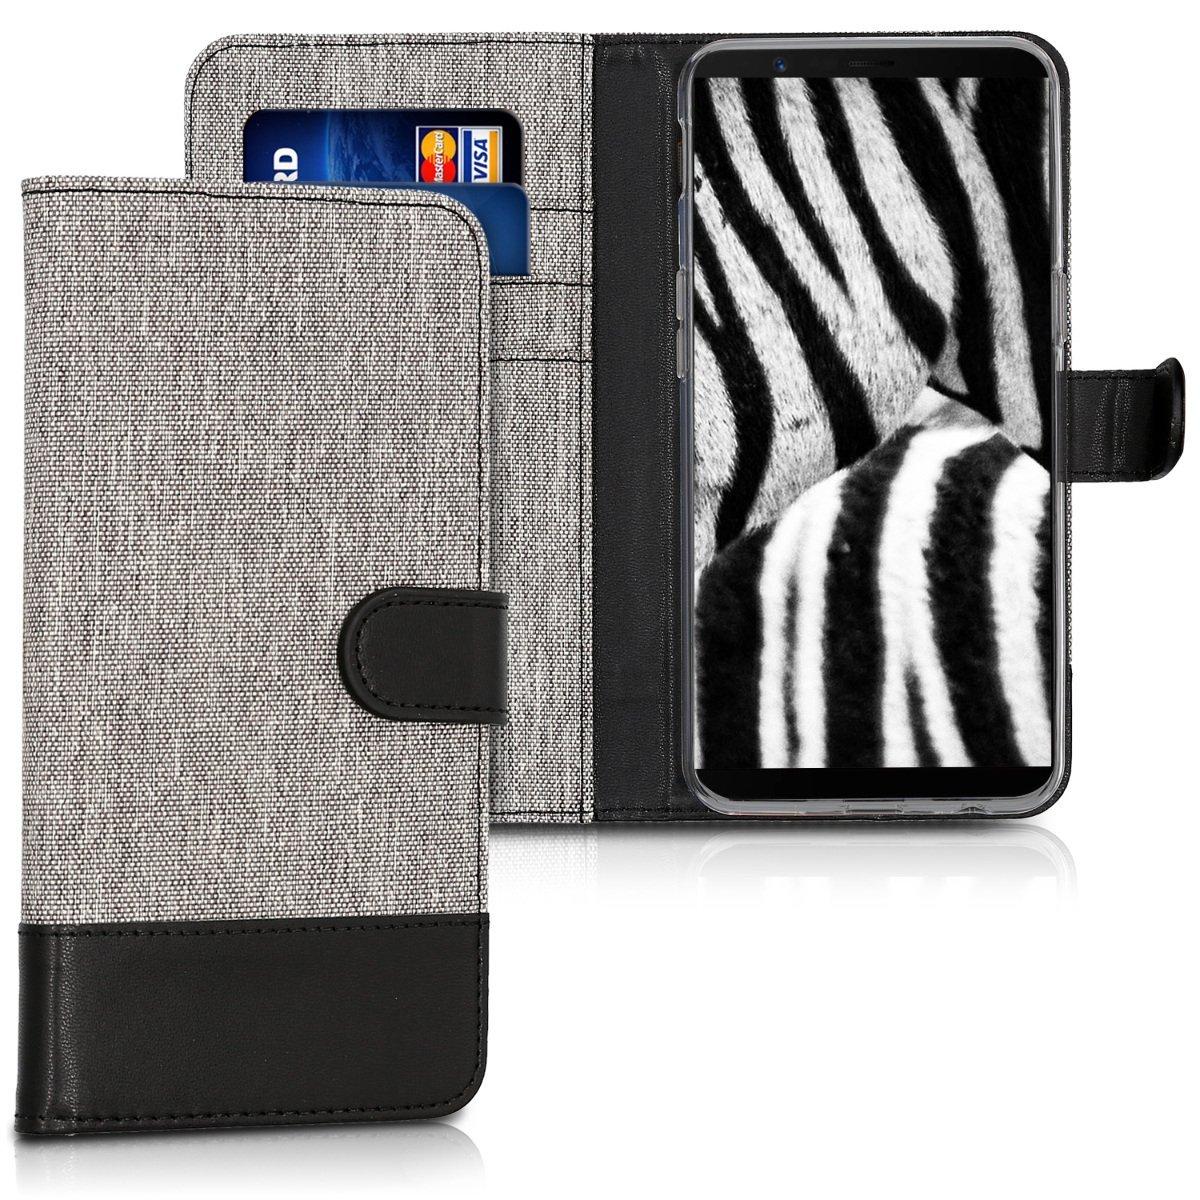 KW Θήκη - Πορτοφόλι OnePlus 5T - Grey / Black Canvas(43815.02)